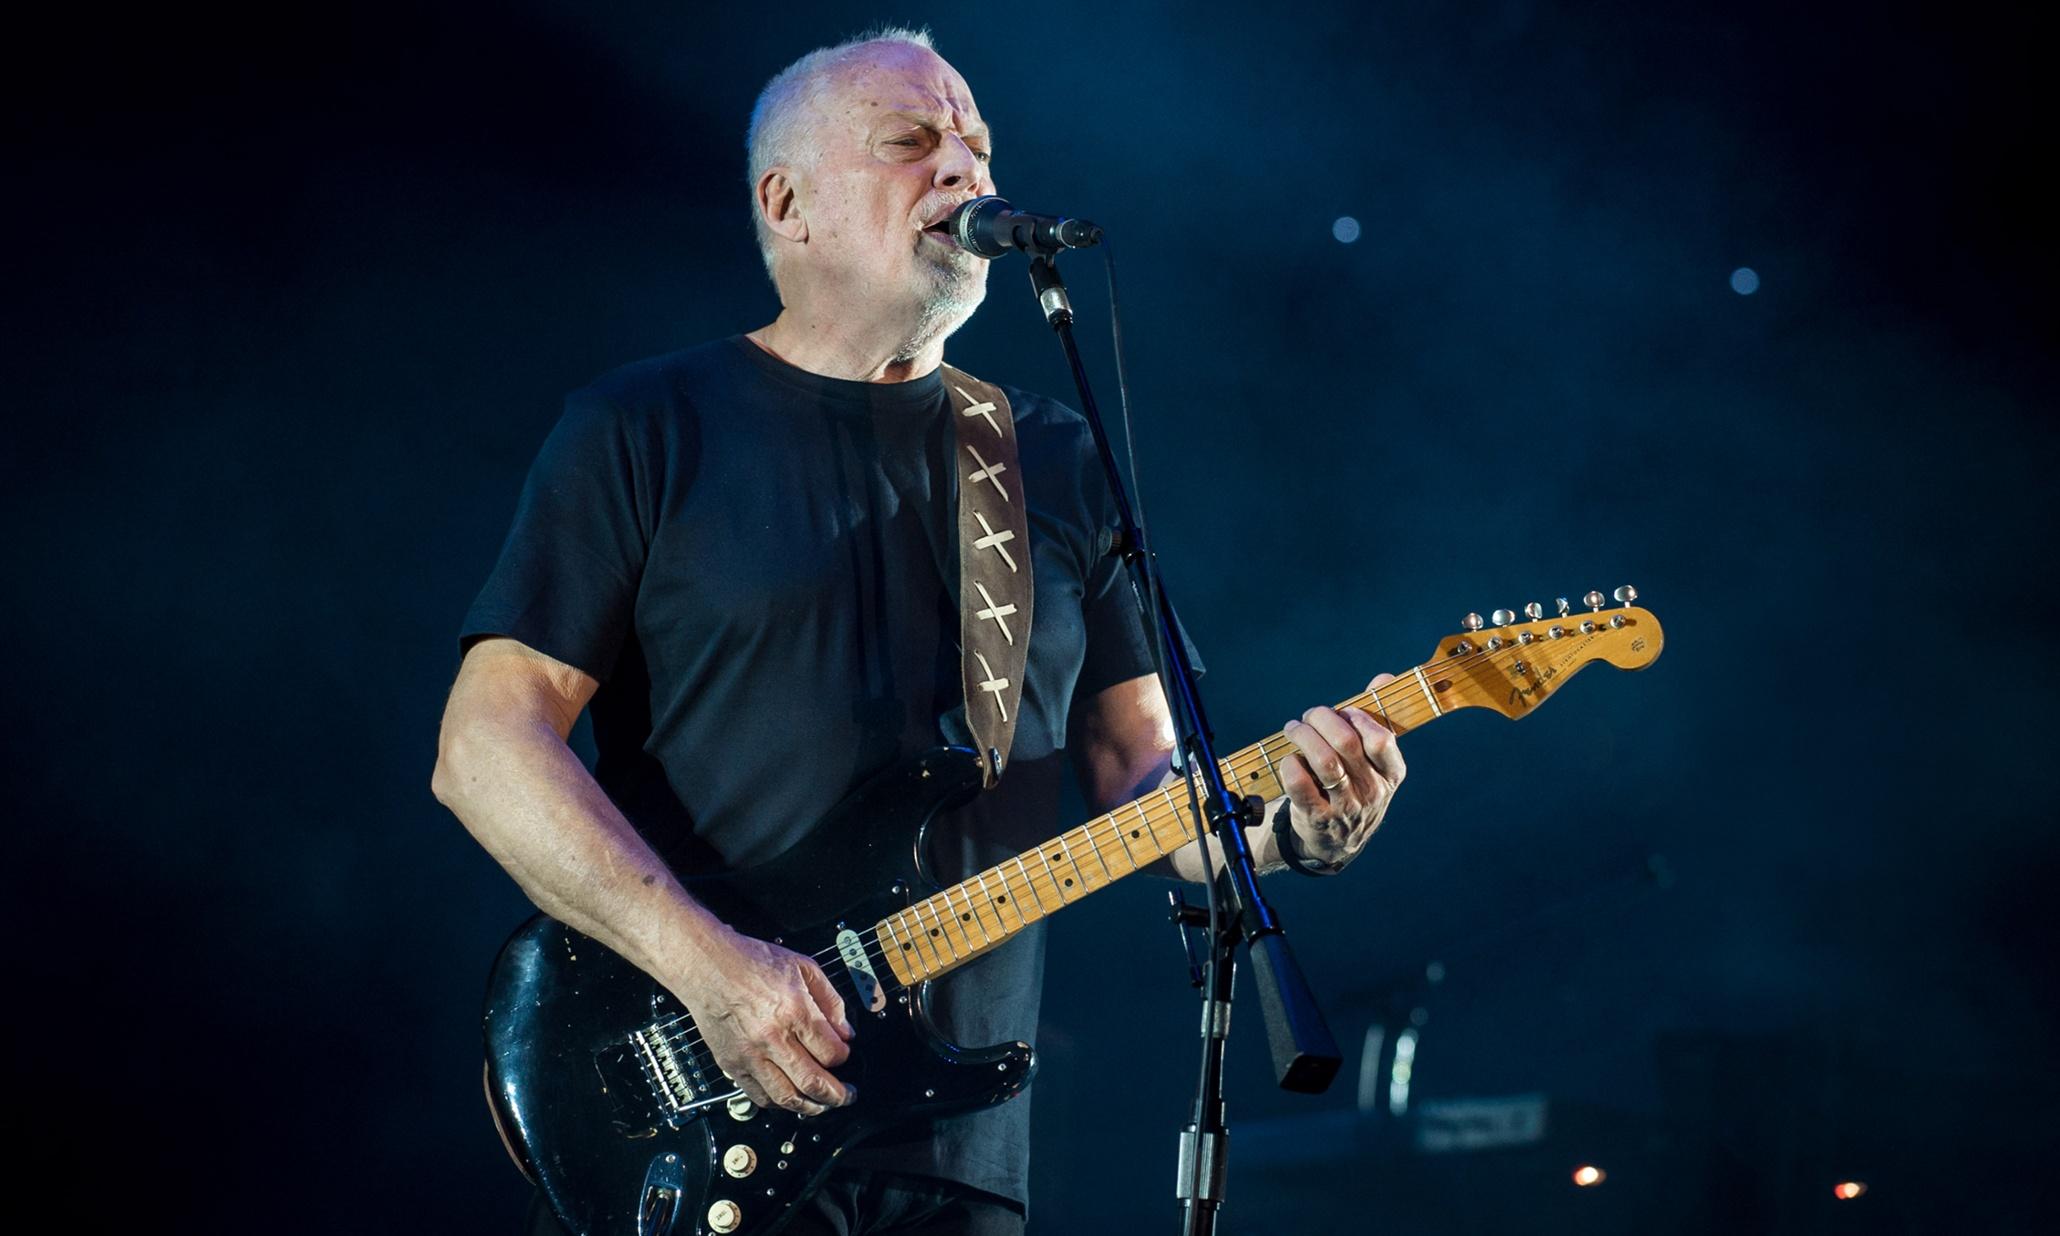 David-Gilmour-keeps-on-touring